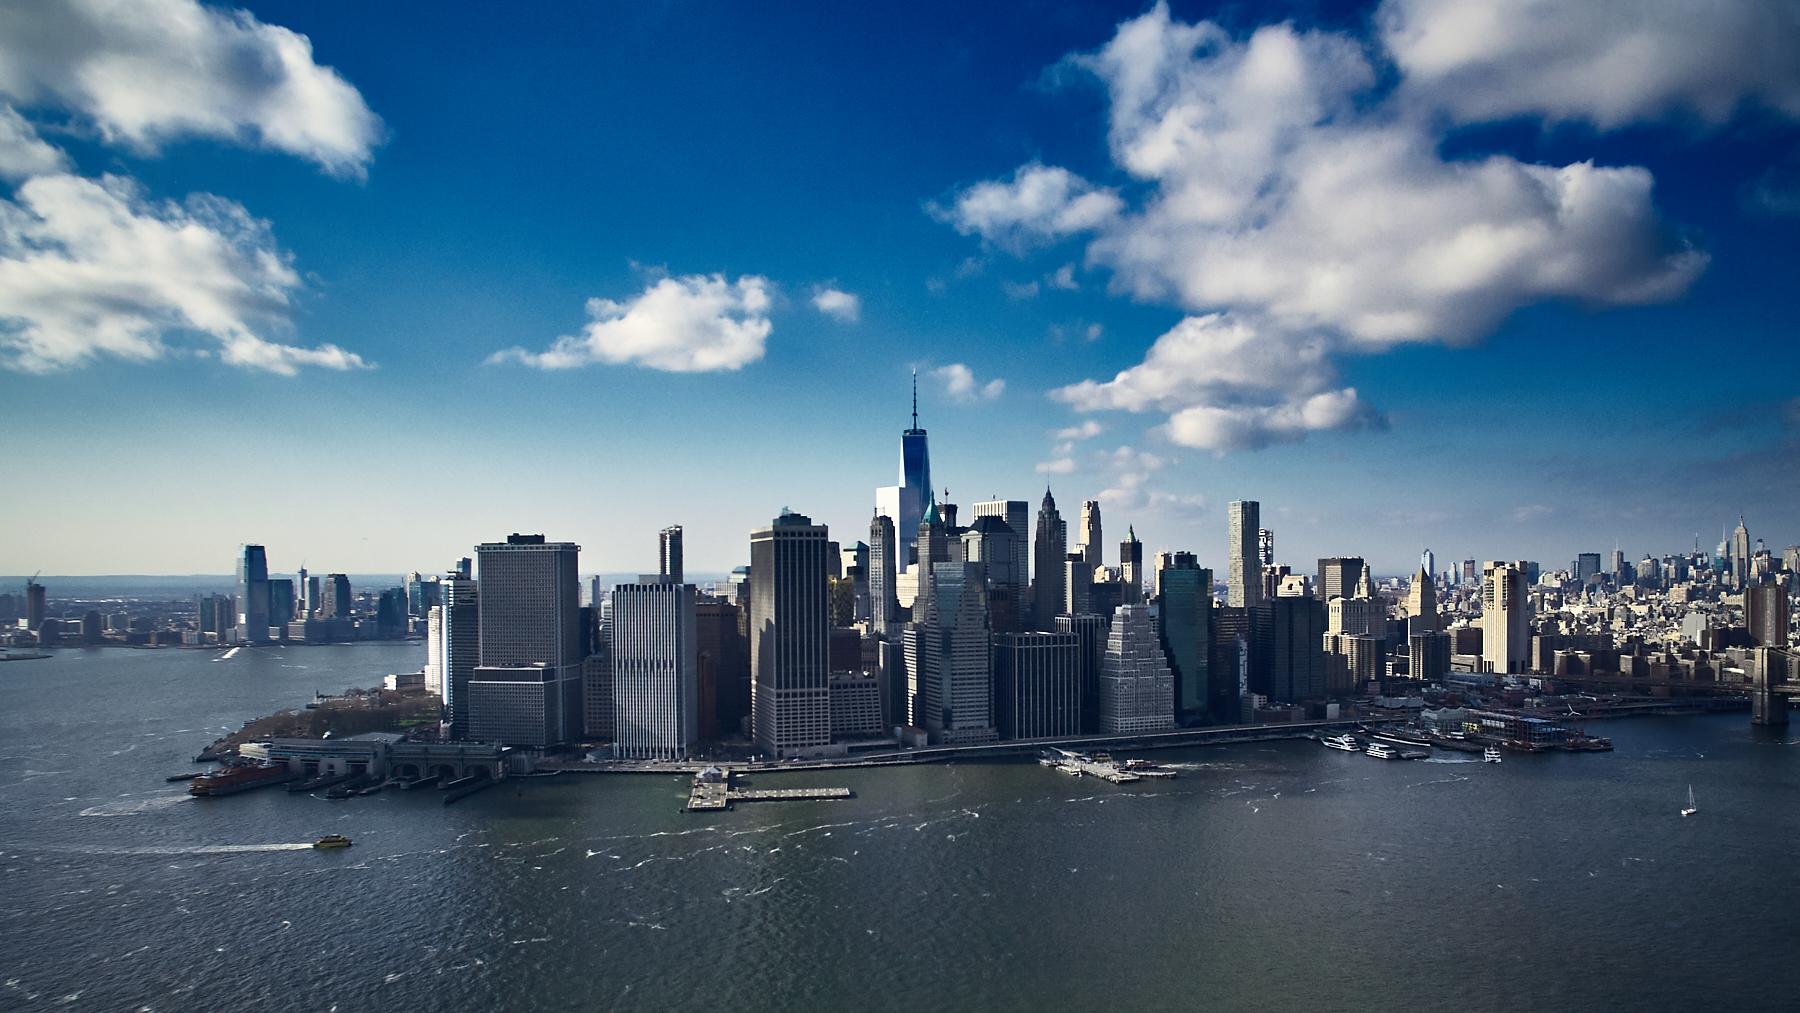 160326_Drone_NYC_021.jpg